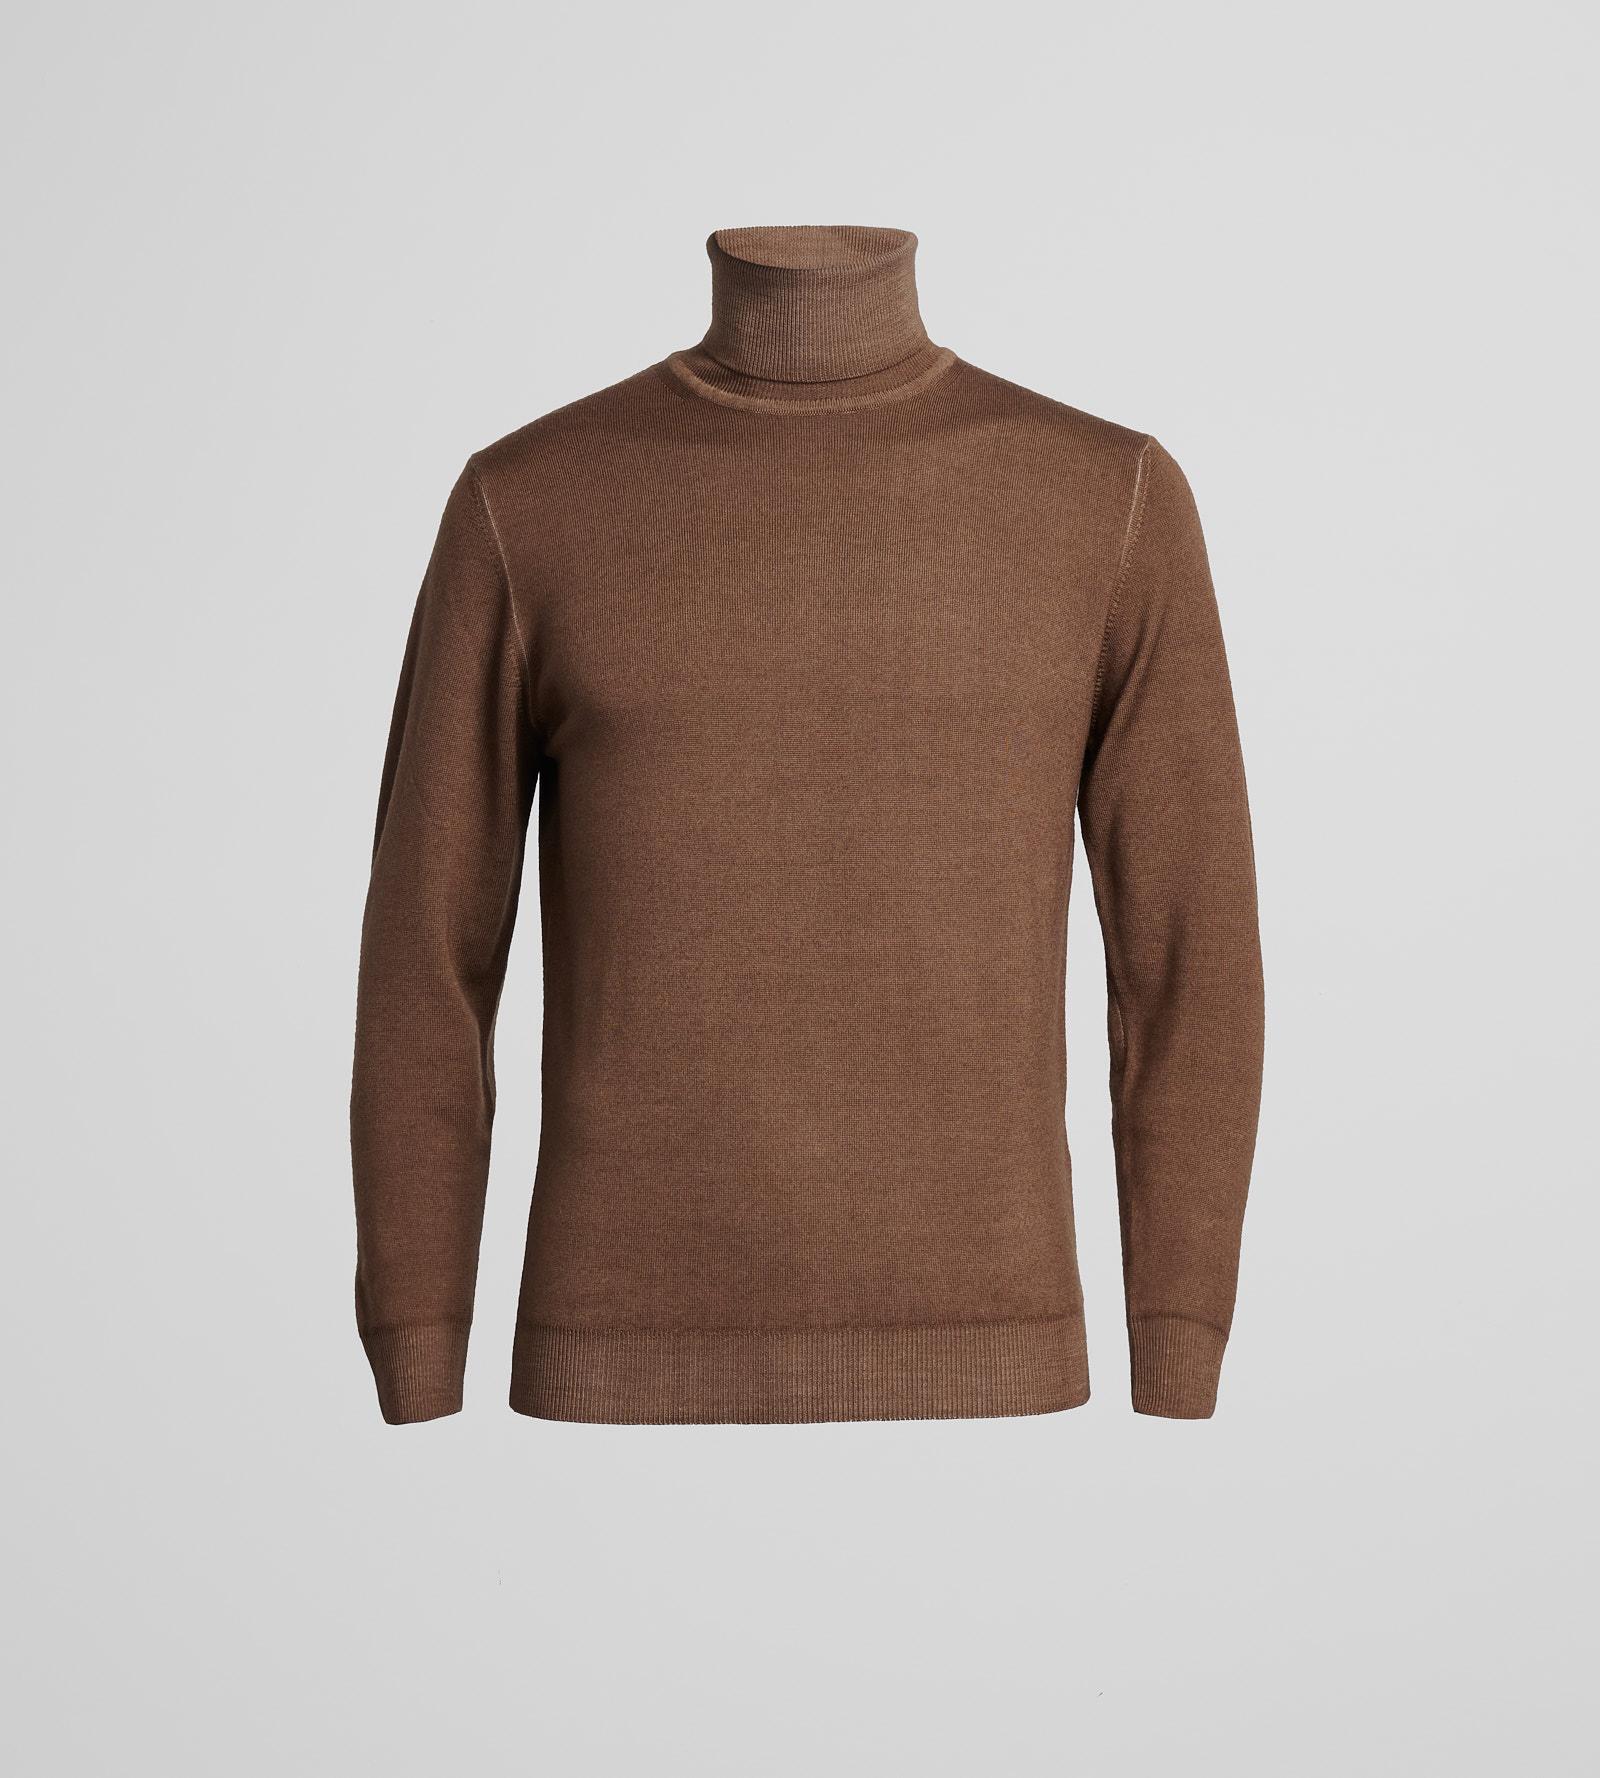 digel-barna-modern-fit-garbo-nyaku-gyapju-pulover-francis1-1-1288001-32